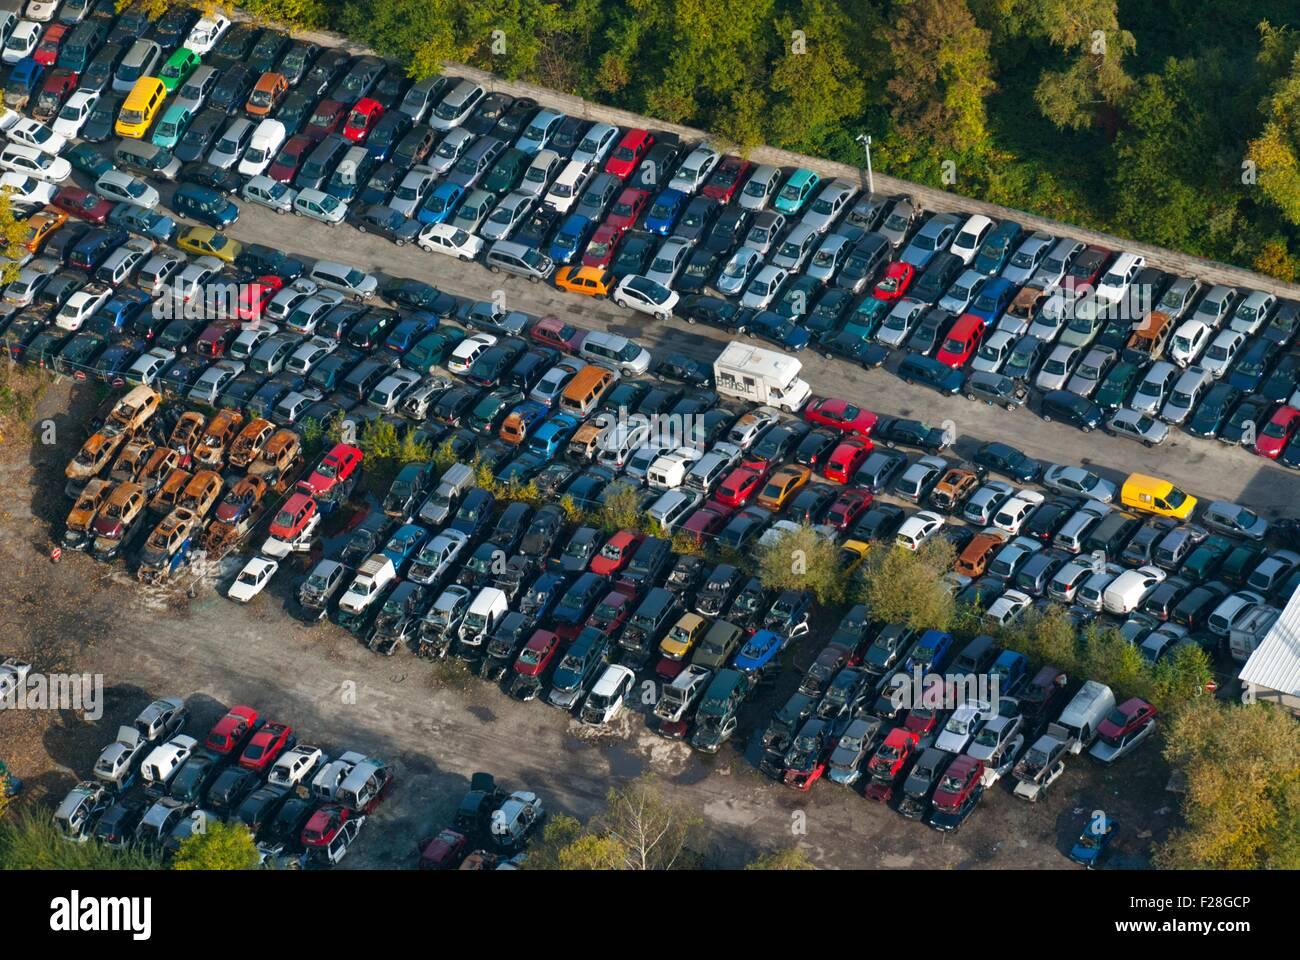 France, Bas Rhin (67), Vendenheim, cars recycling site (aerial view)  // Bas Rhin (67), Vendenheim, casse automobile - Stock Image